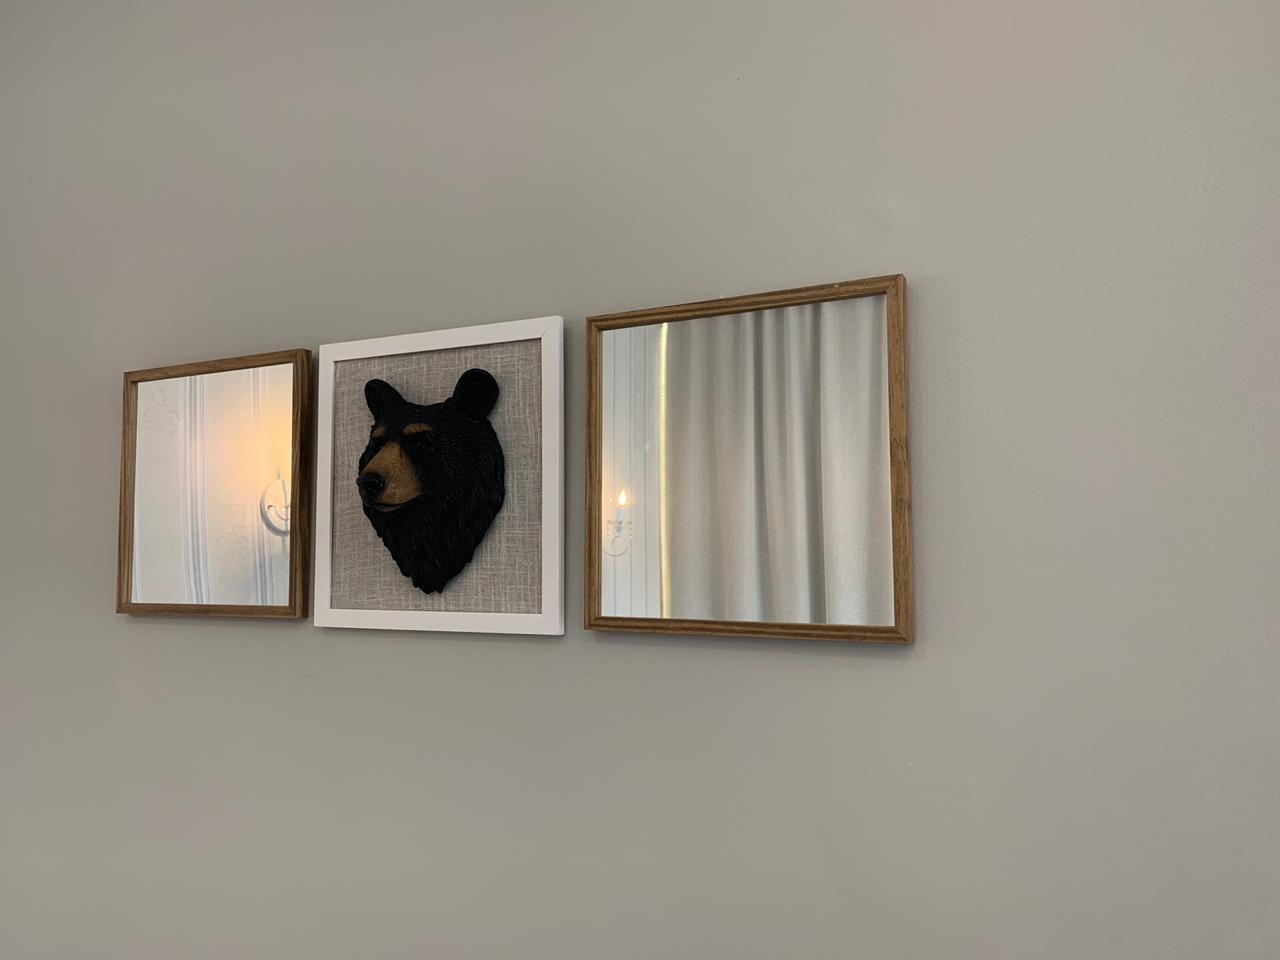 3 quadros decorativos